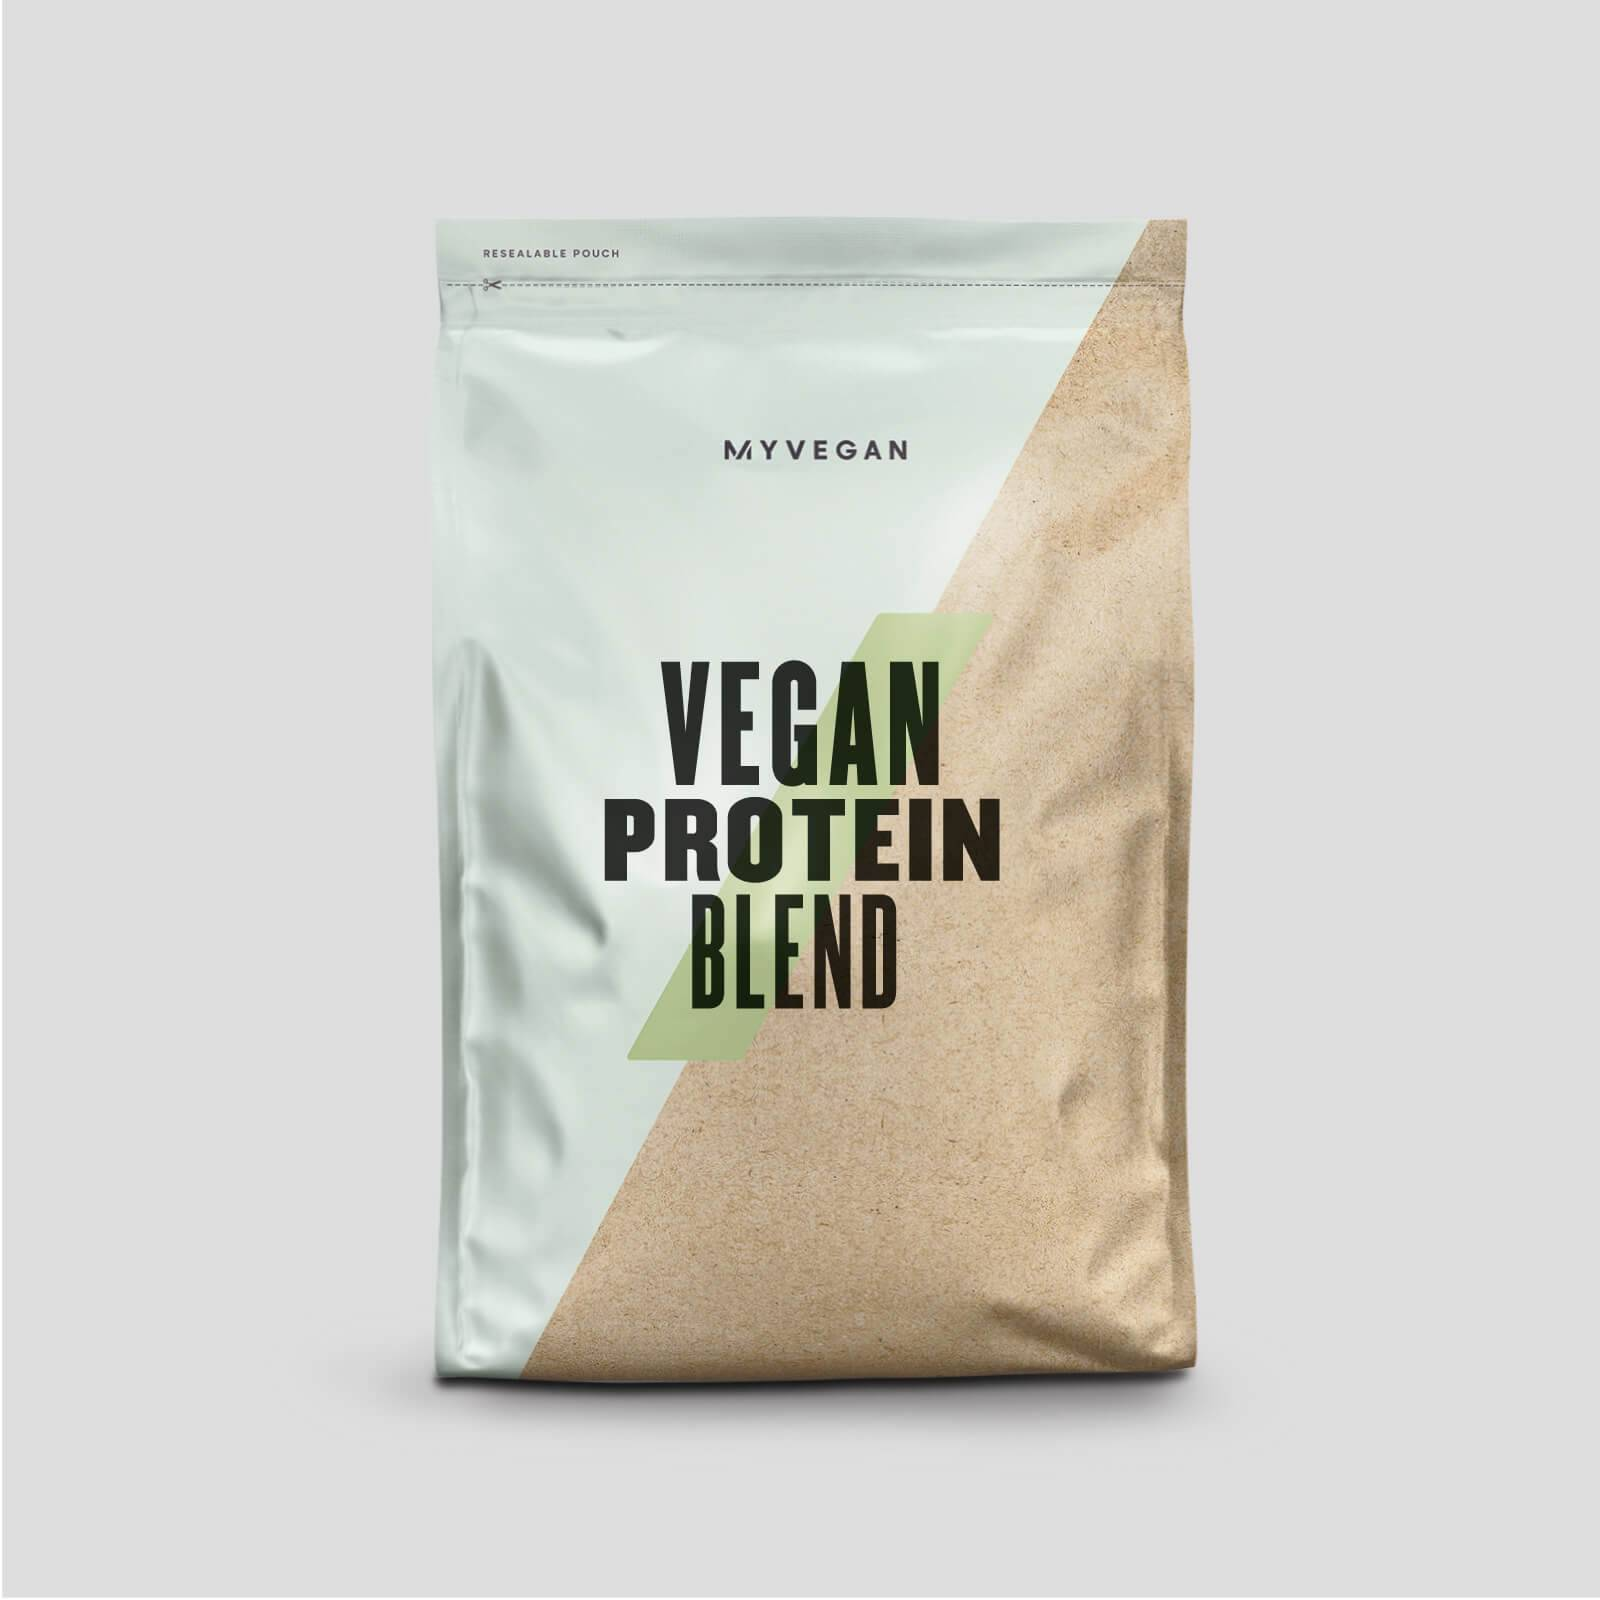 Myvegan Mélange de protéines végétales - 500g - Coffee & Walnut